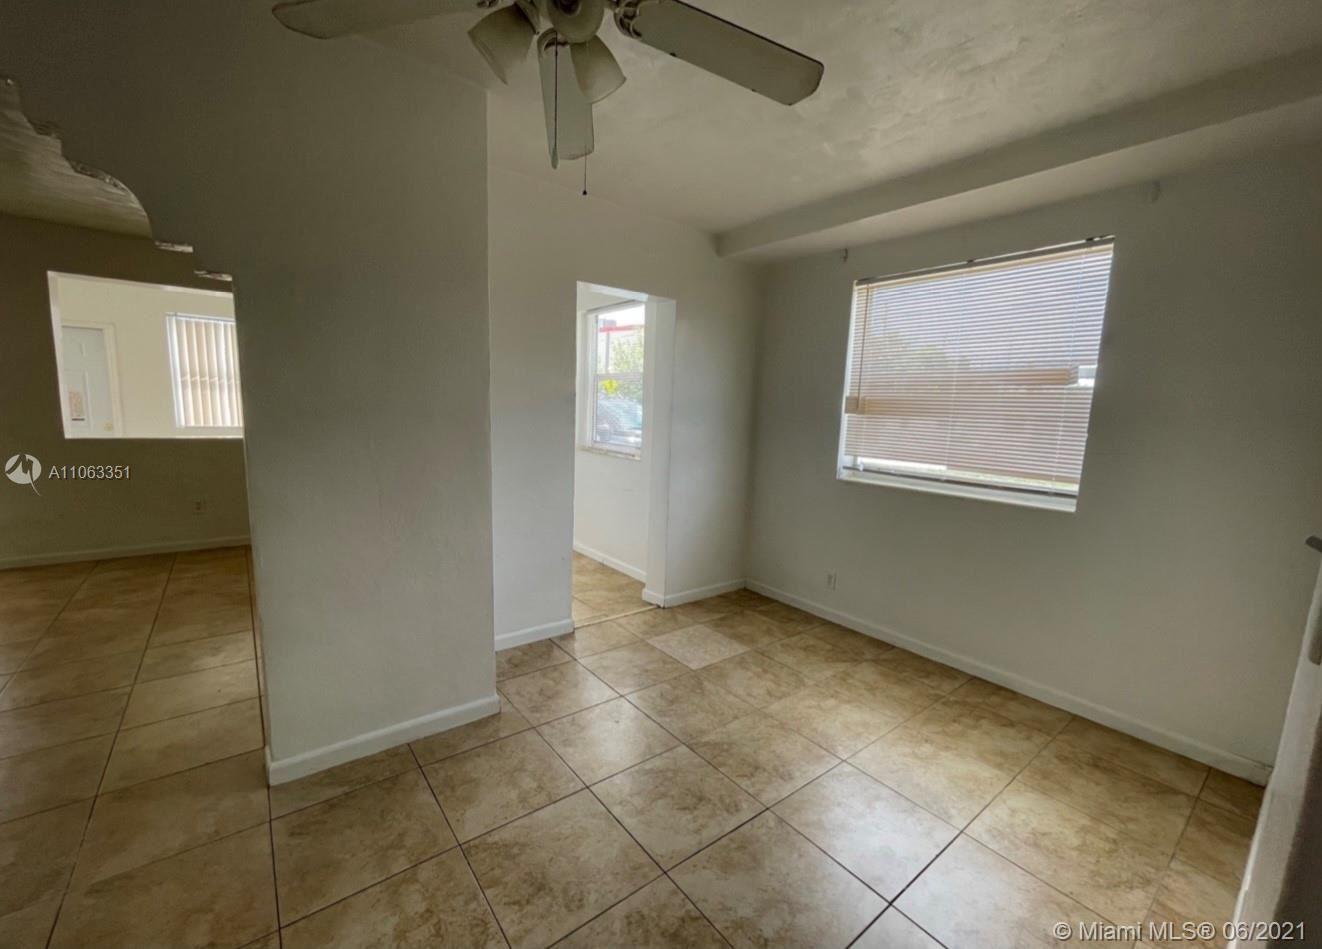 Photo of 98 SW 5th Ave, Dania Beach, FL 33004 (MLS # A11063351)